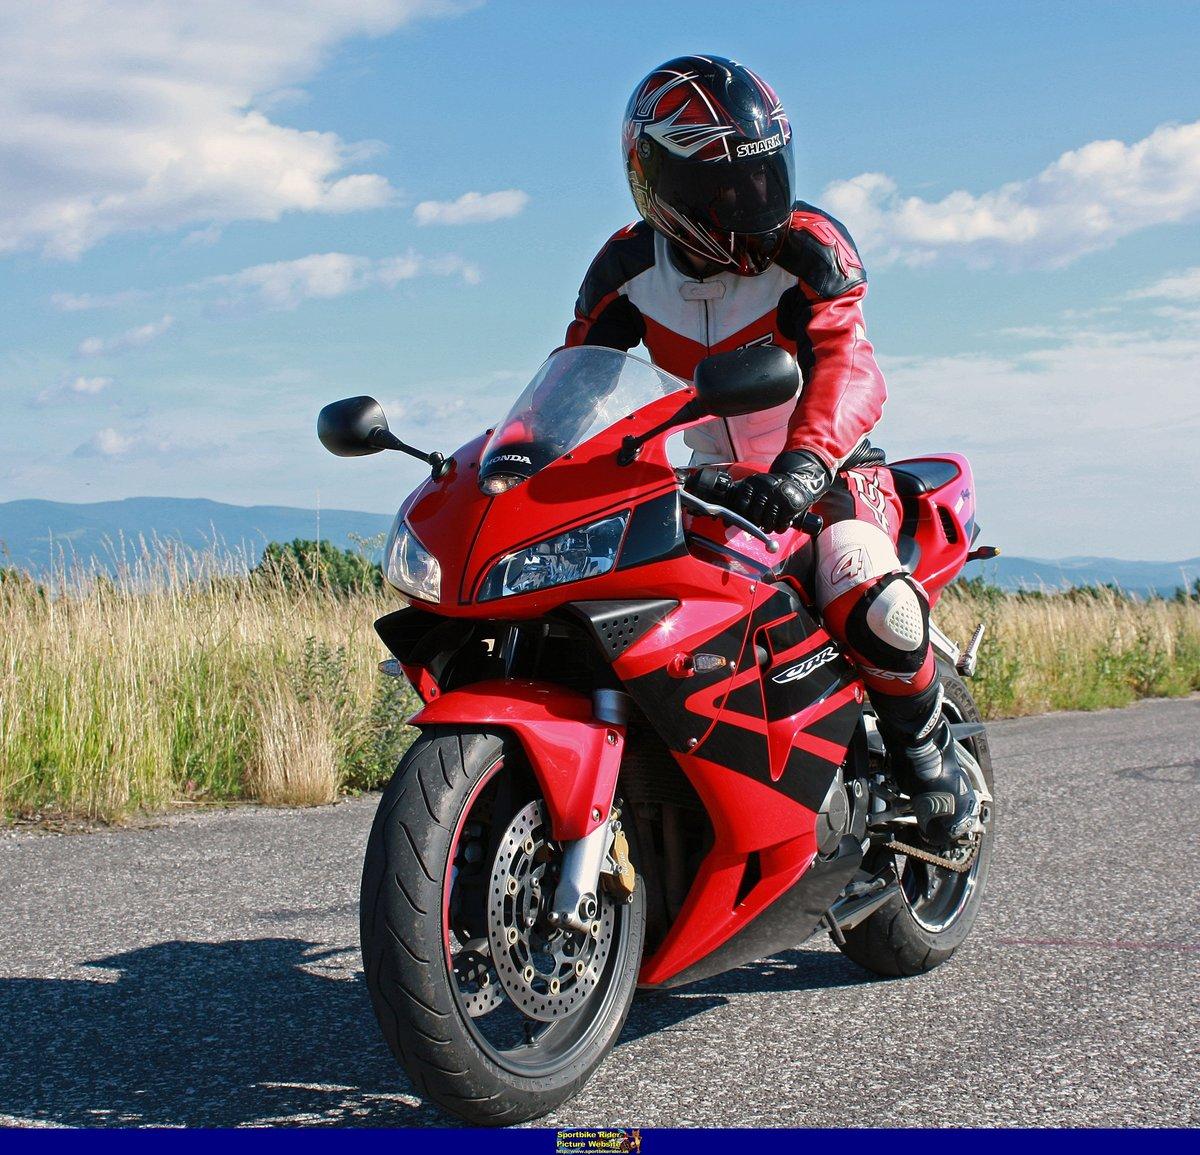 Фото людей на спортивном мотоцикле